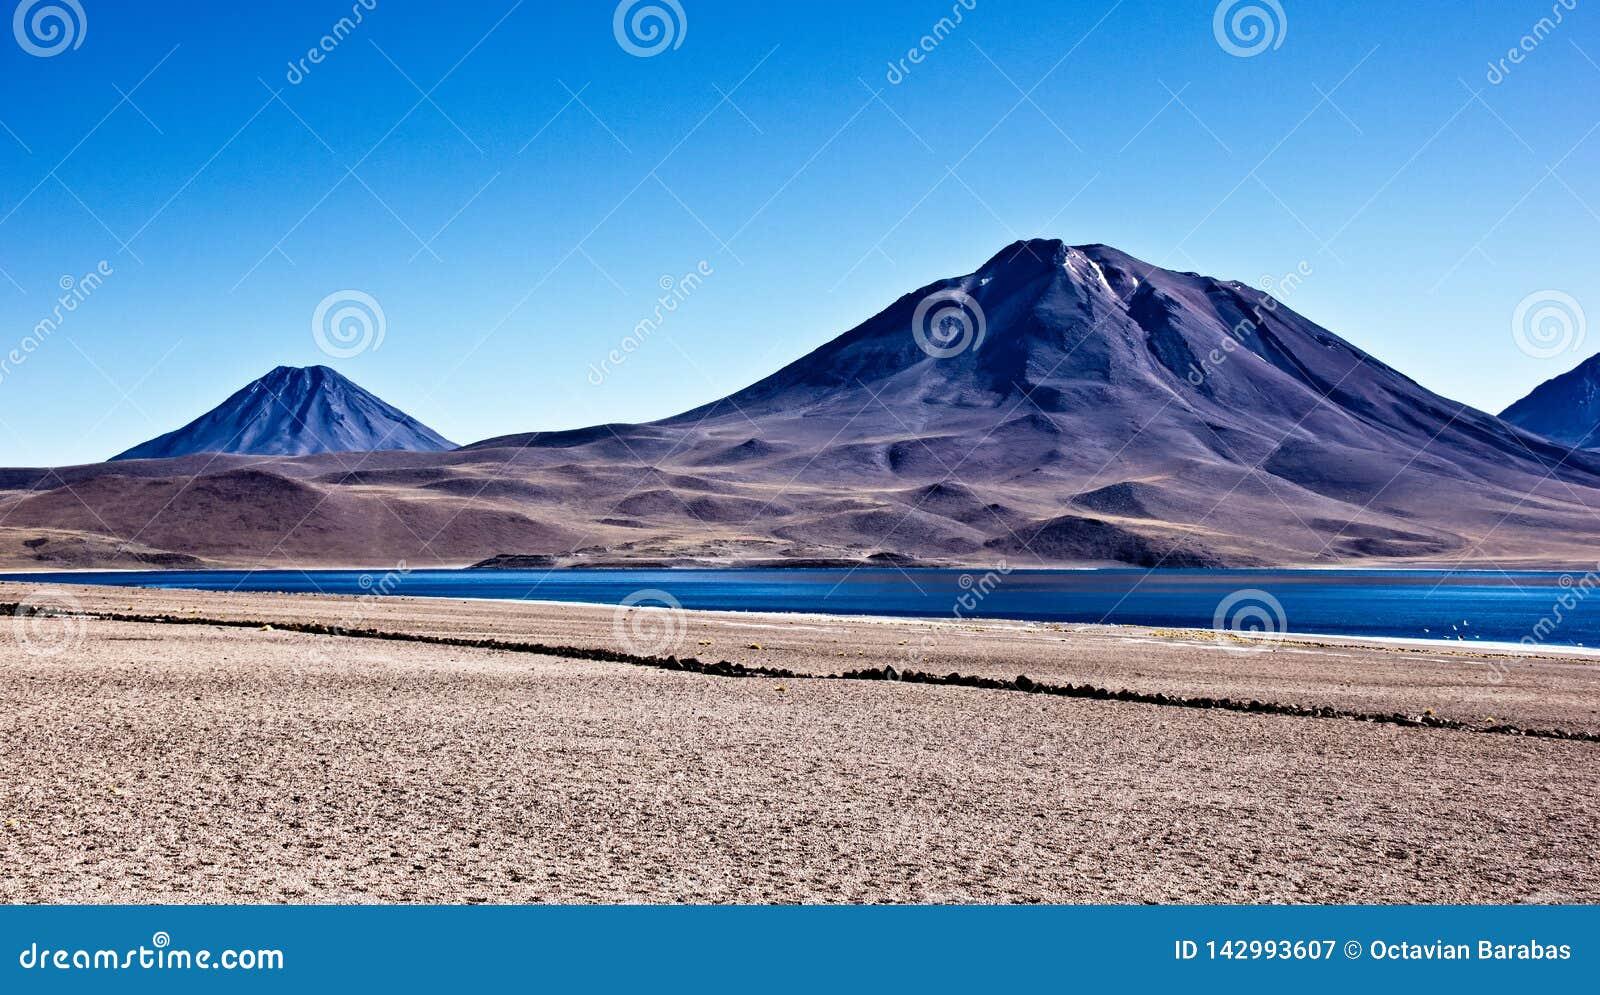 Volcanos in Altiplano in Chile